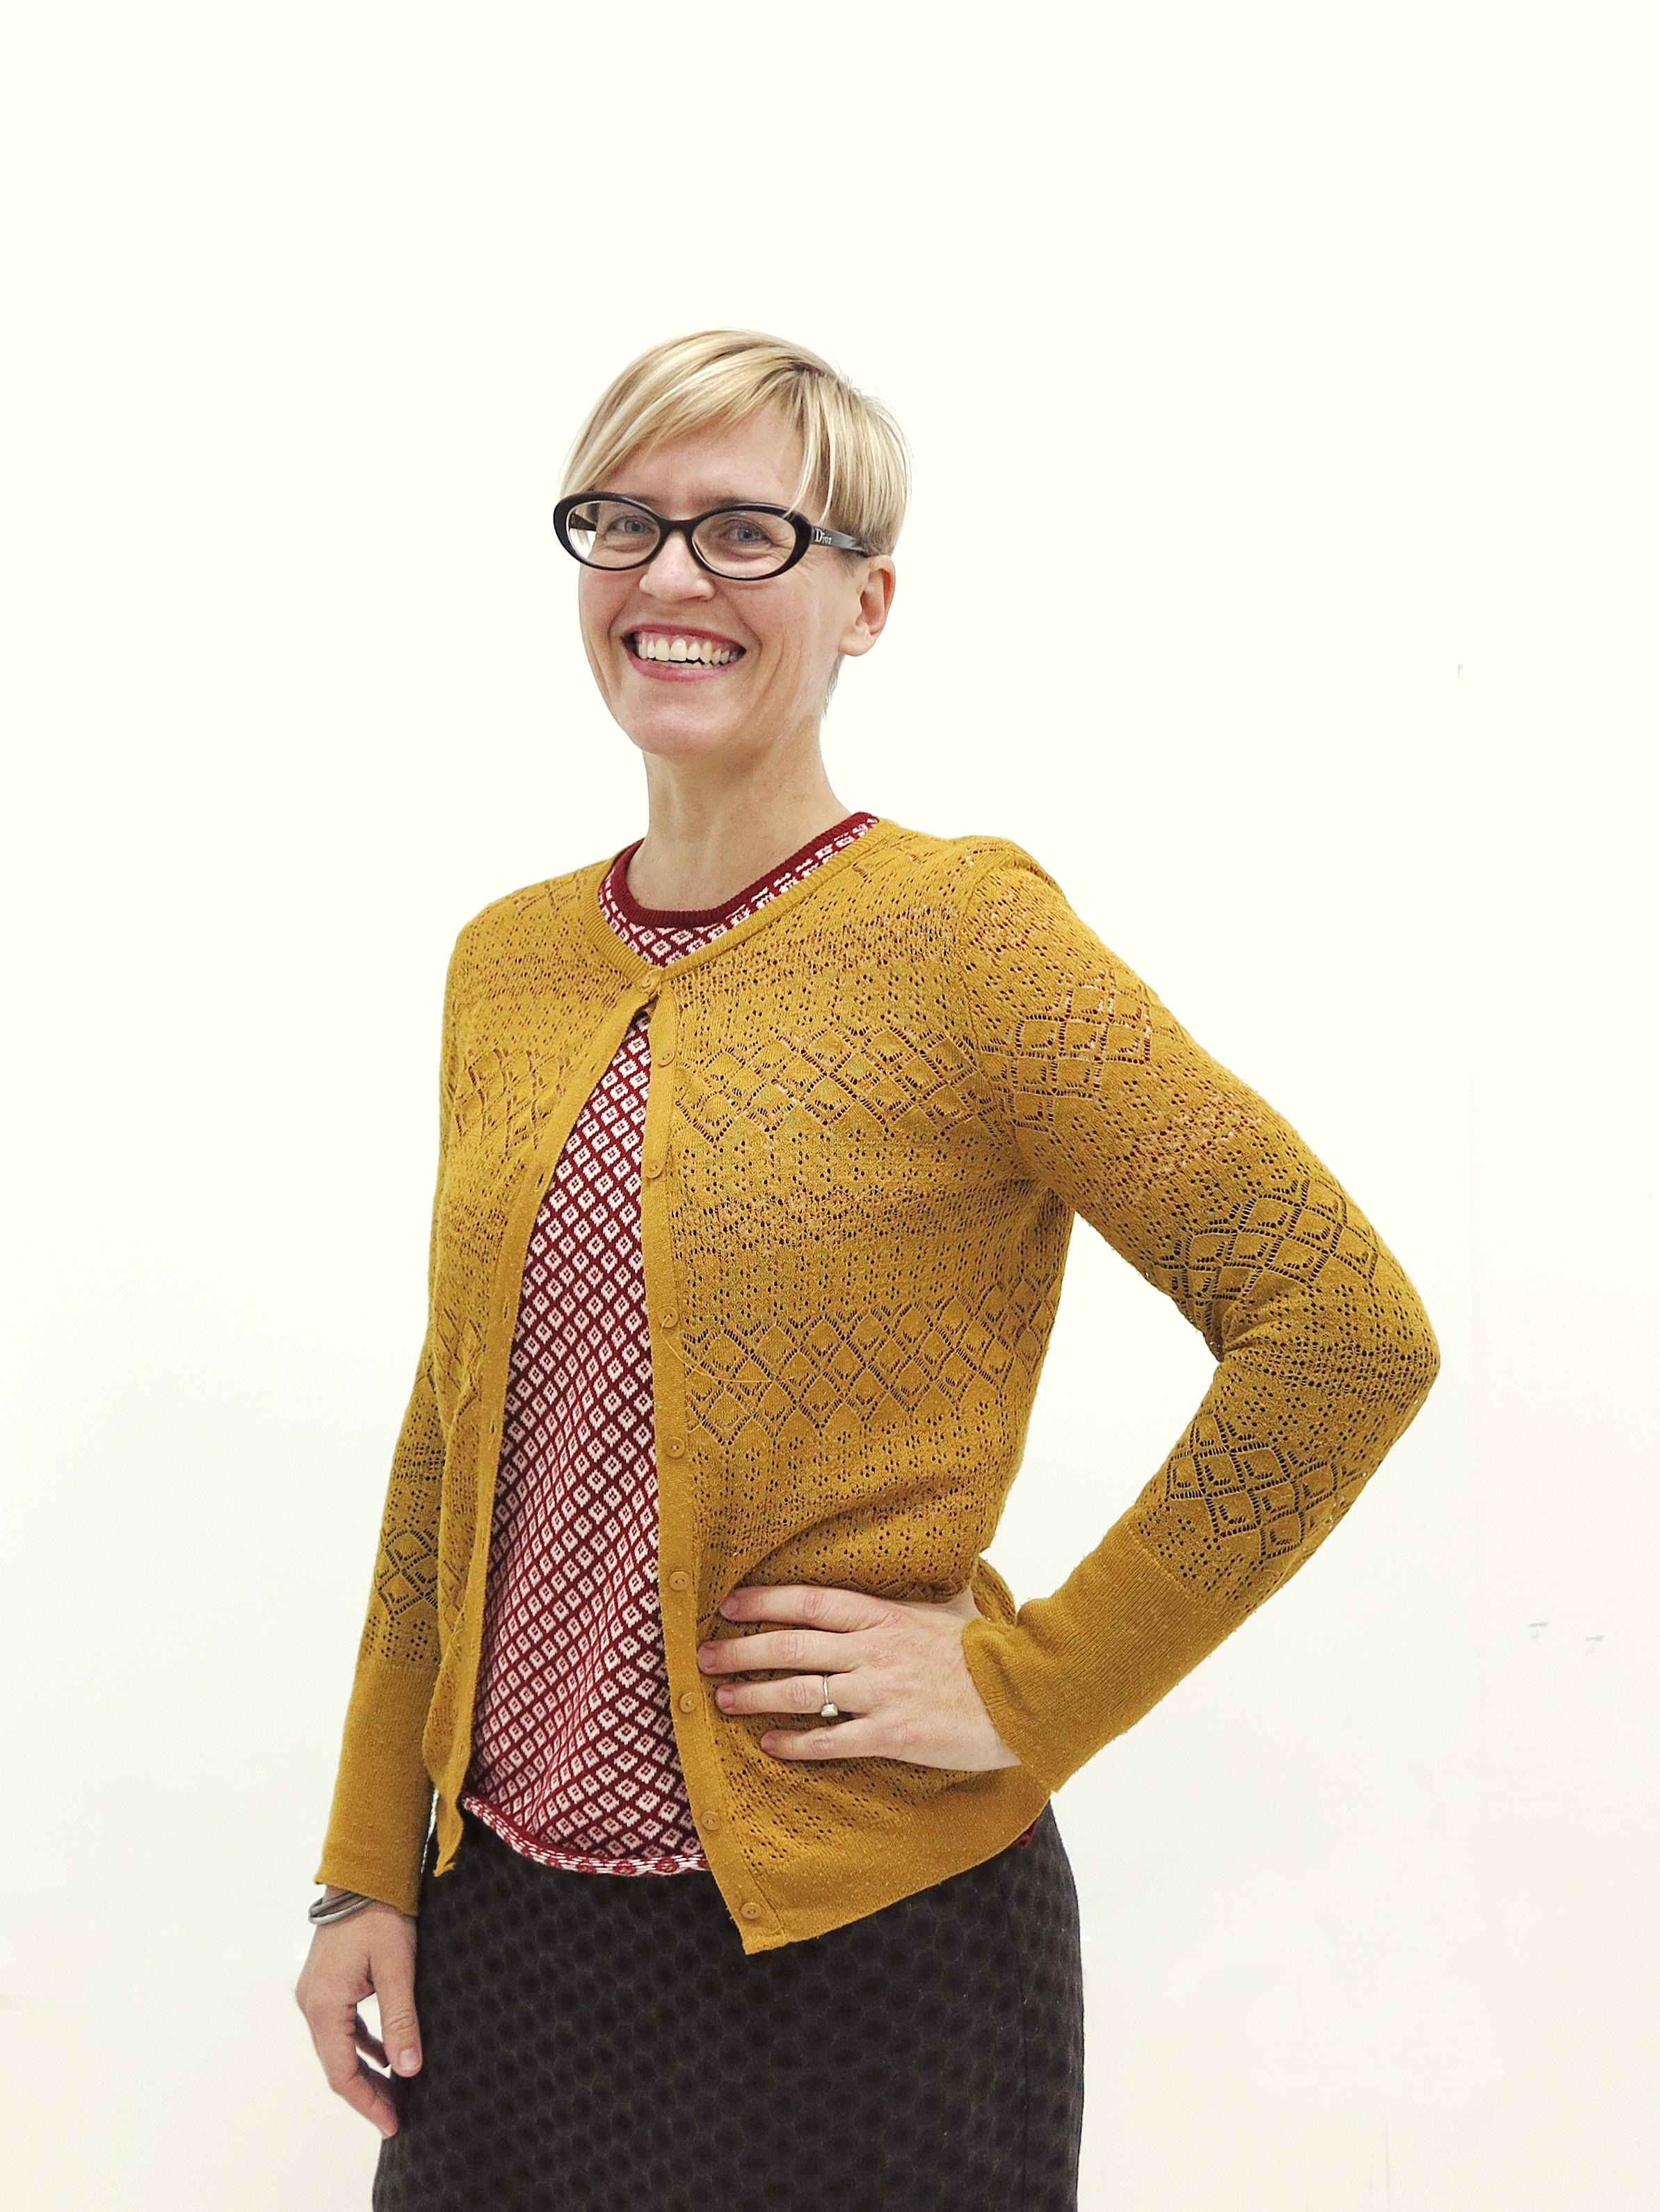 Heather Moore, proprietor of Skinny LaMinx